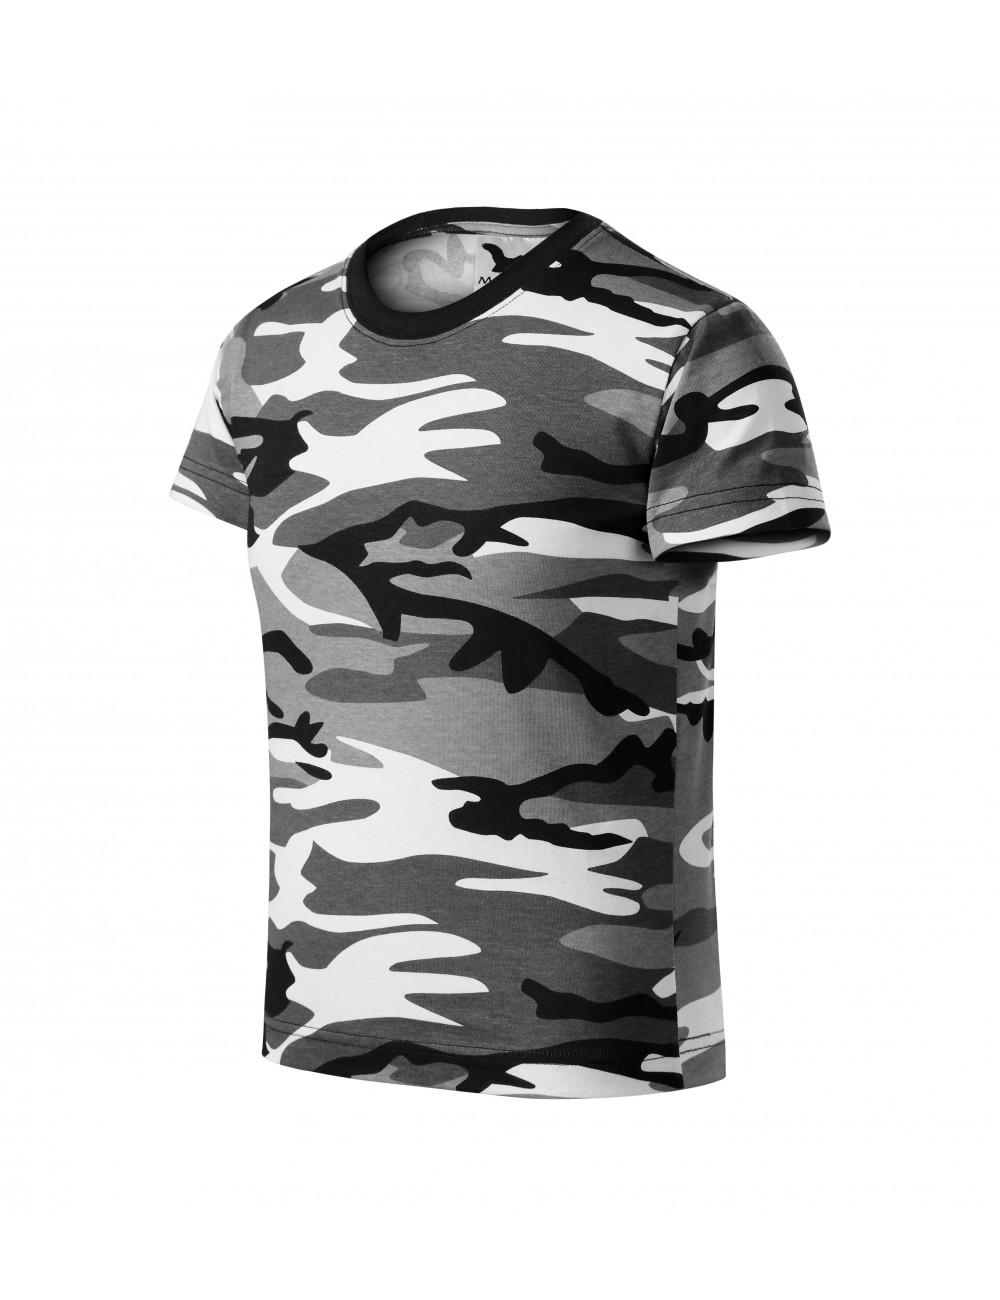 Adler MALFINI Koszulka dziecięca Camouflage 149 camouflage gray